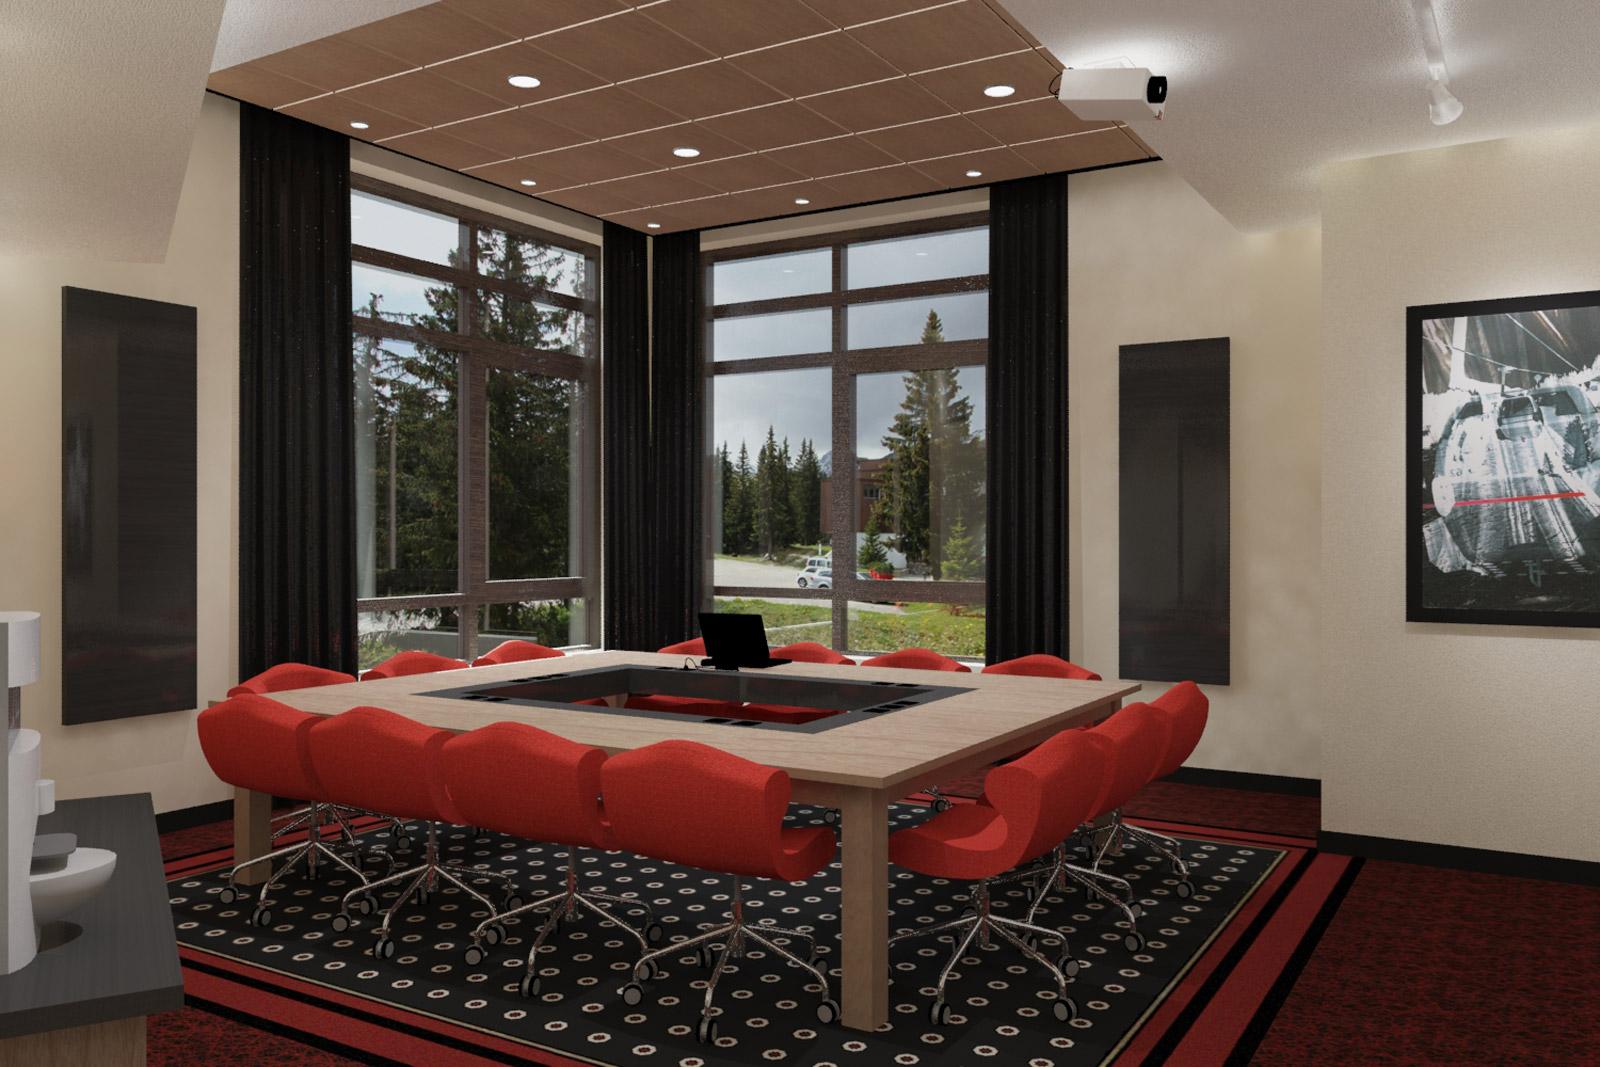 Salon 1 - image 3D v1